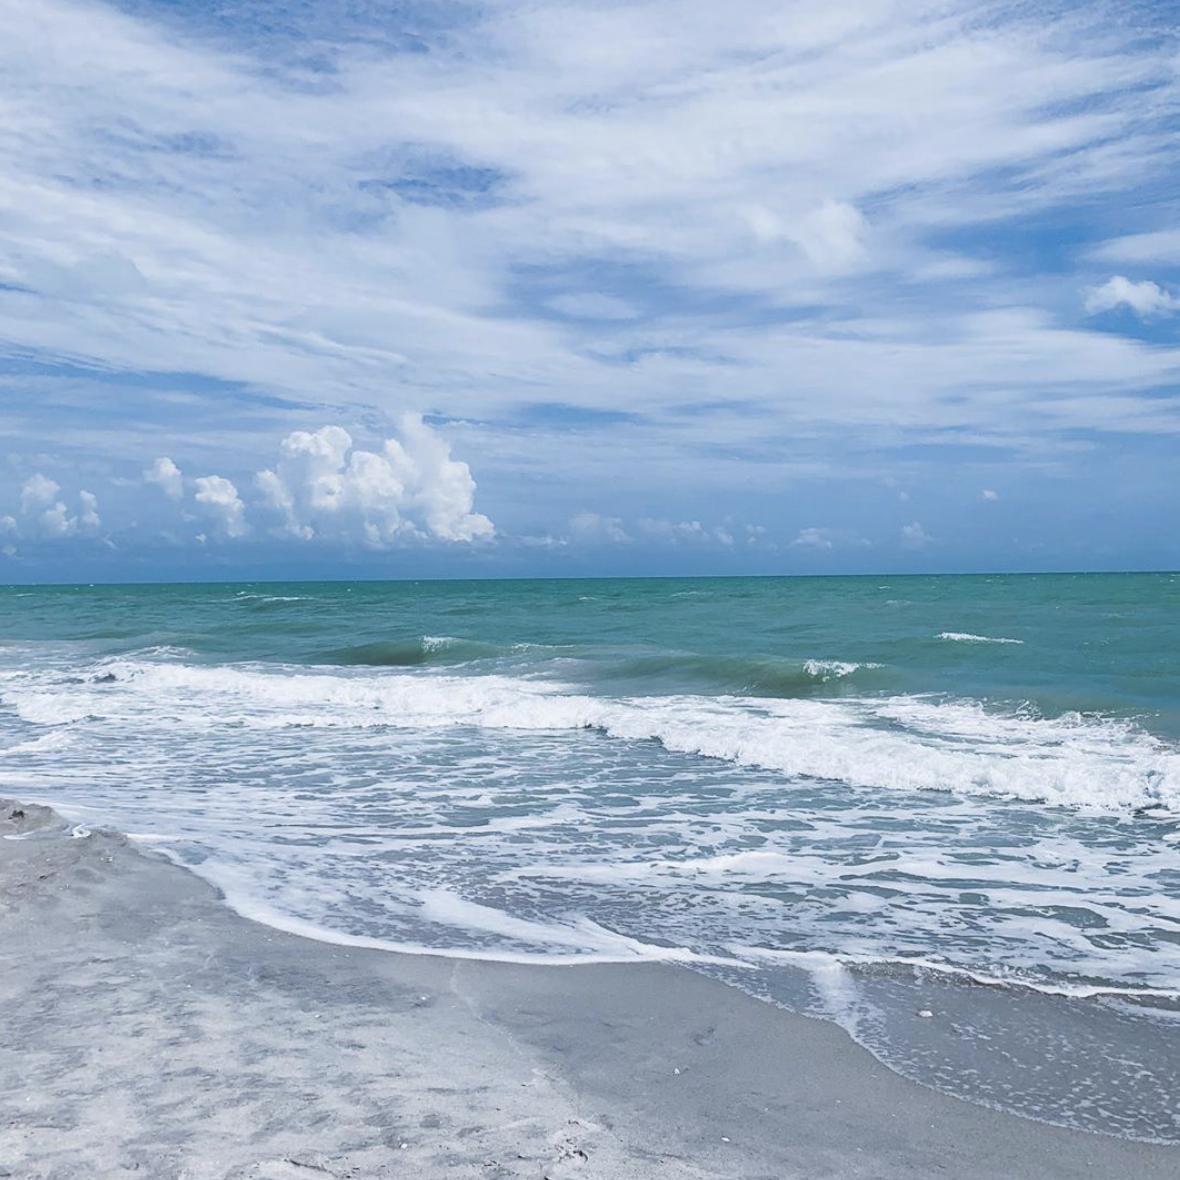 West Wind Inn 250 Value Island Rewards Coupon Book Vacation Goals Florida Vacation Captiva Island